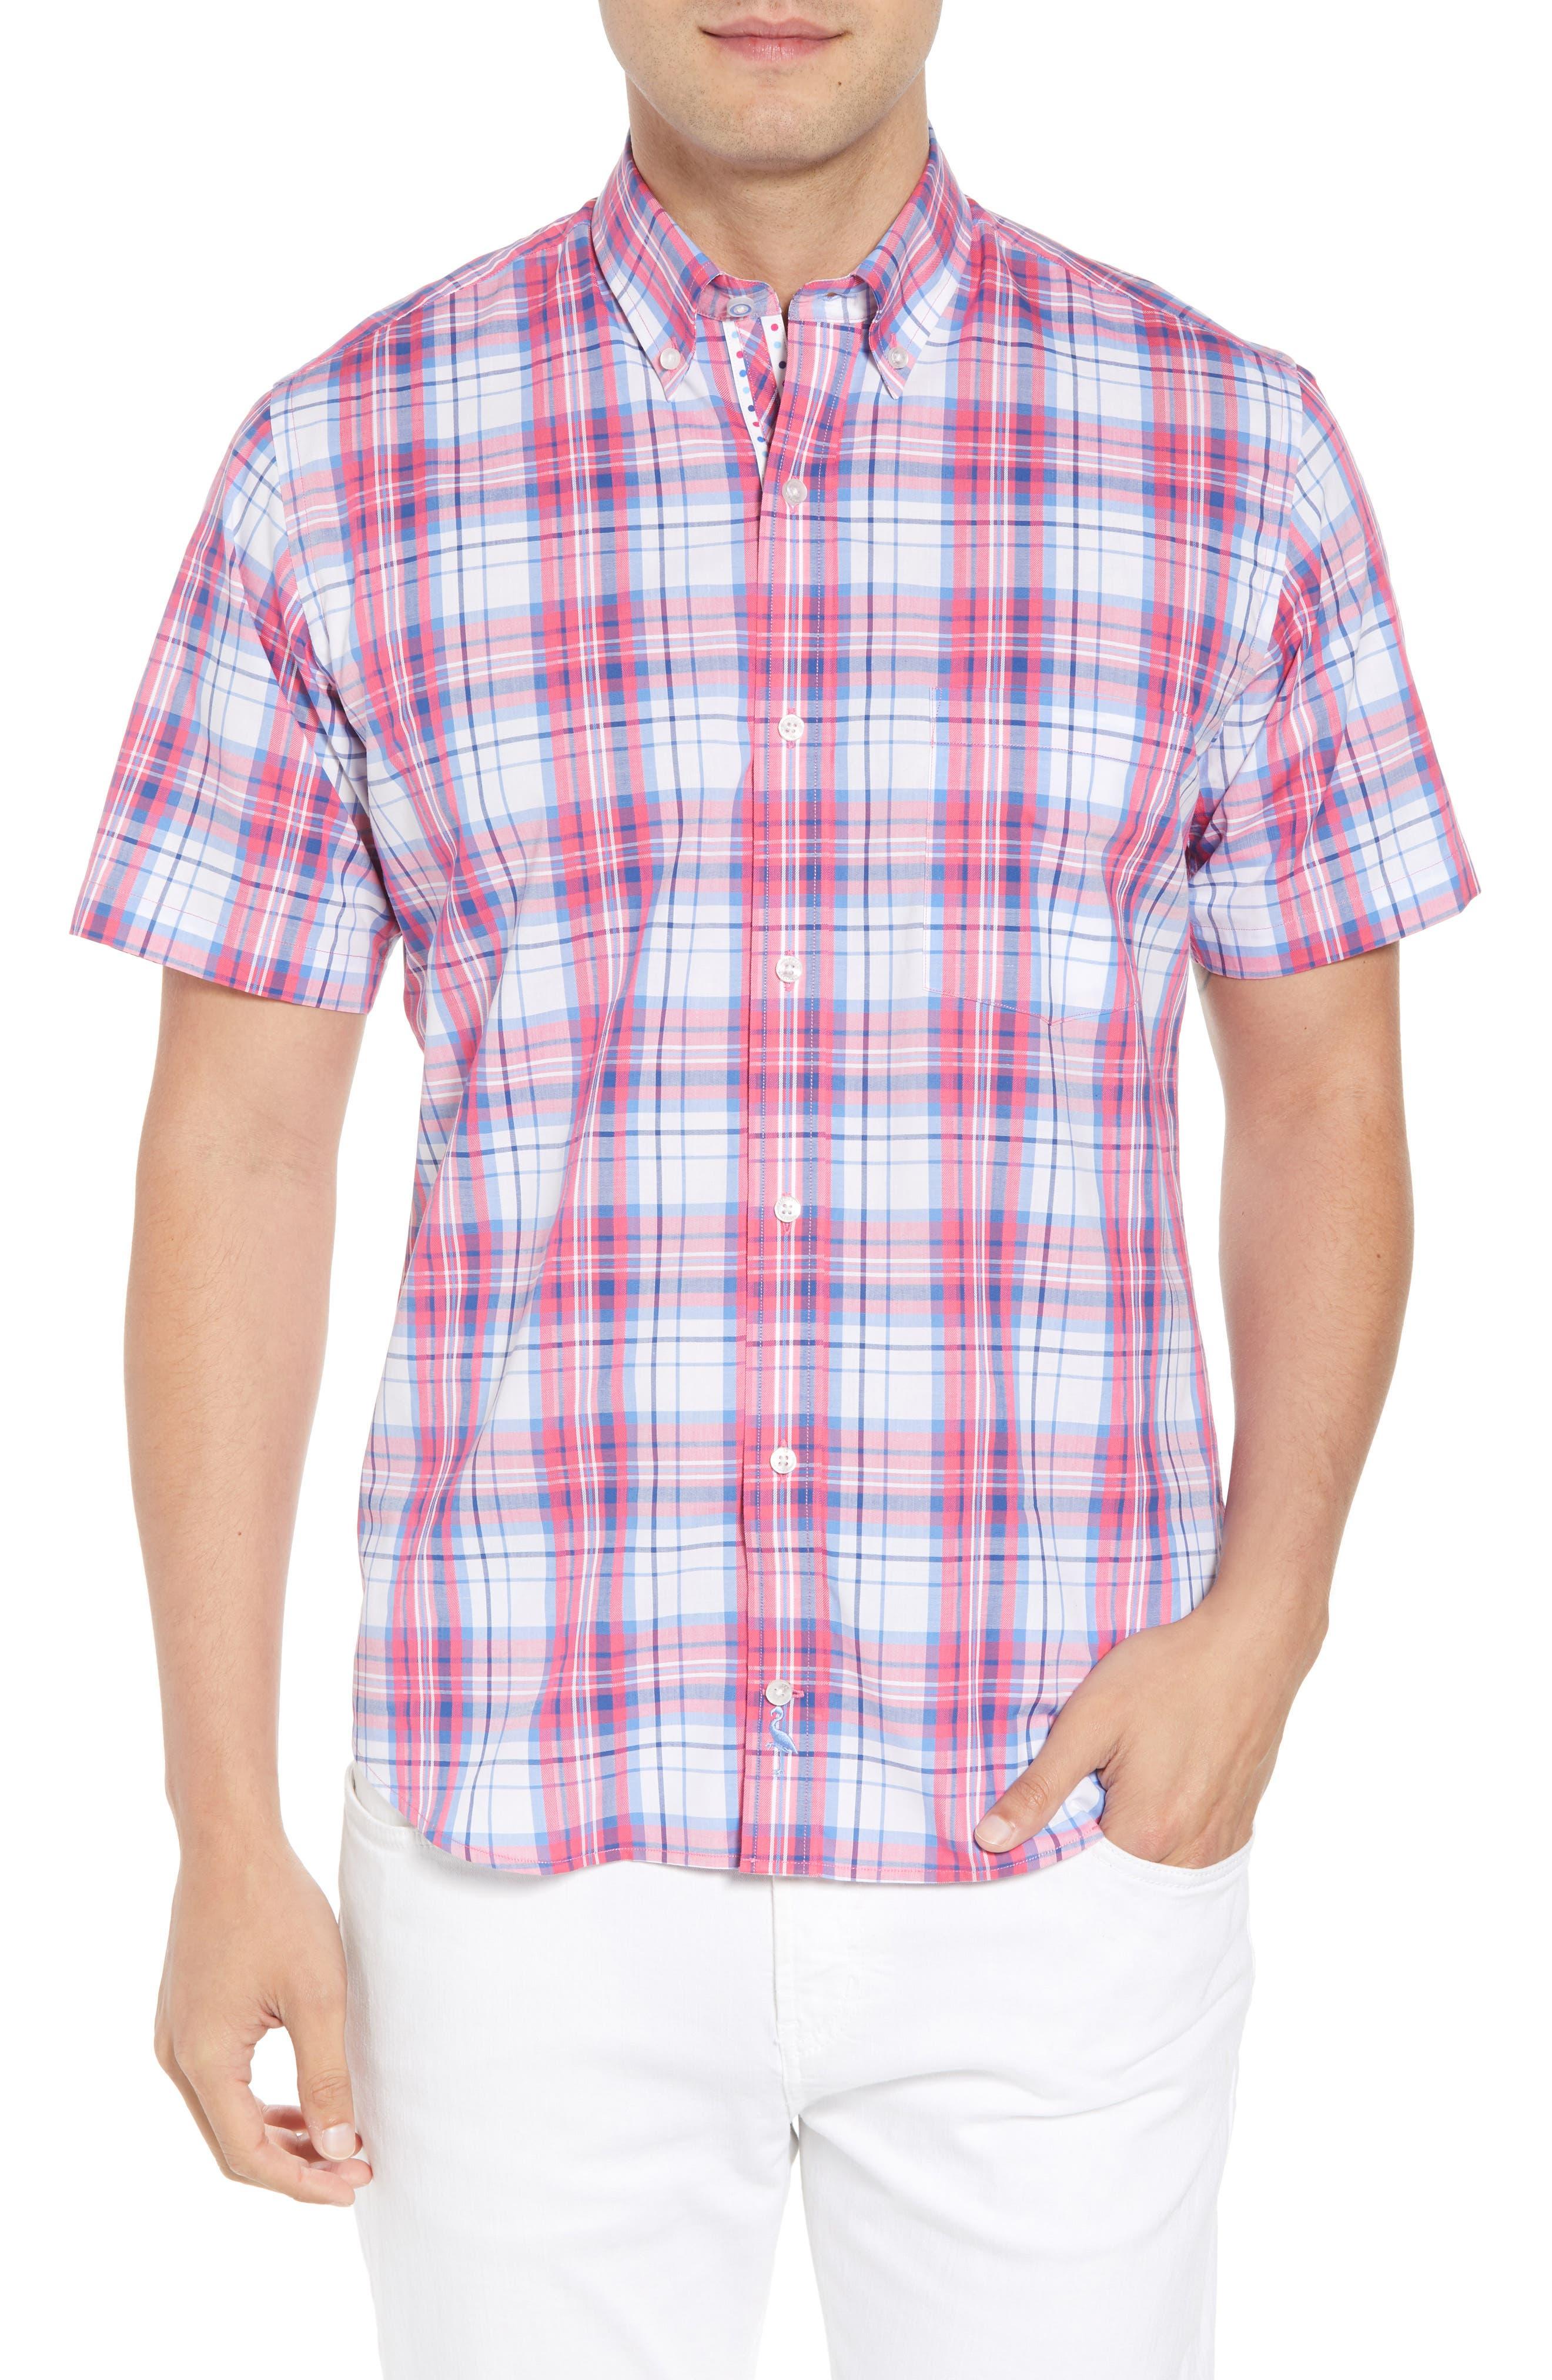 Alesso Regular Fit Plaid Sport Shirt,                         Main,                         color, 950